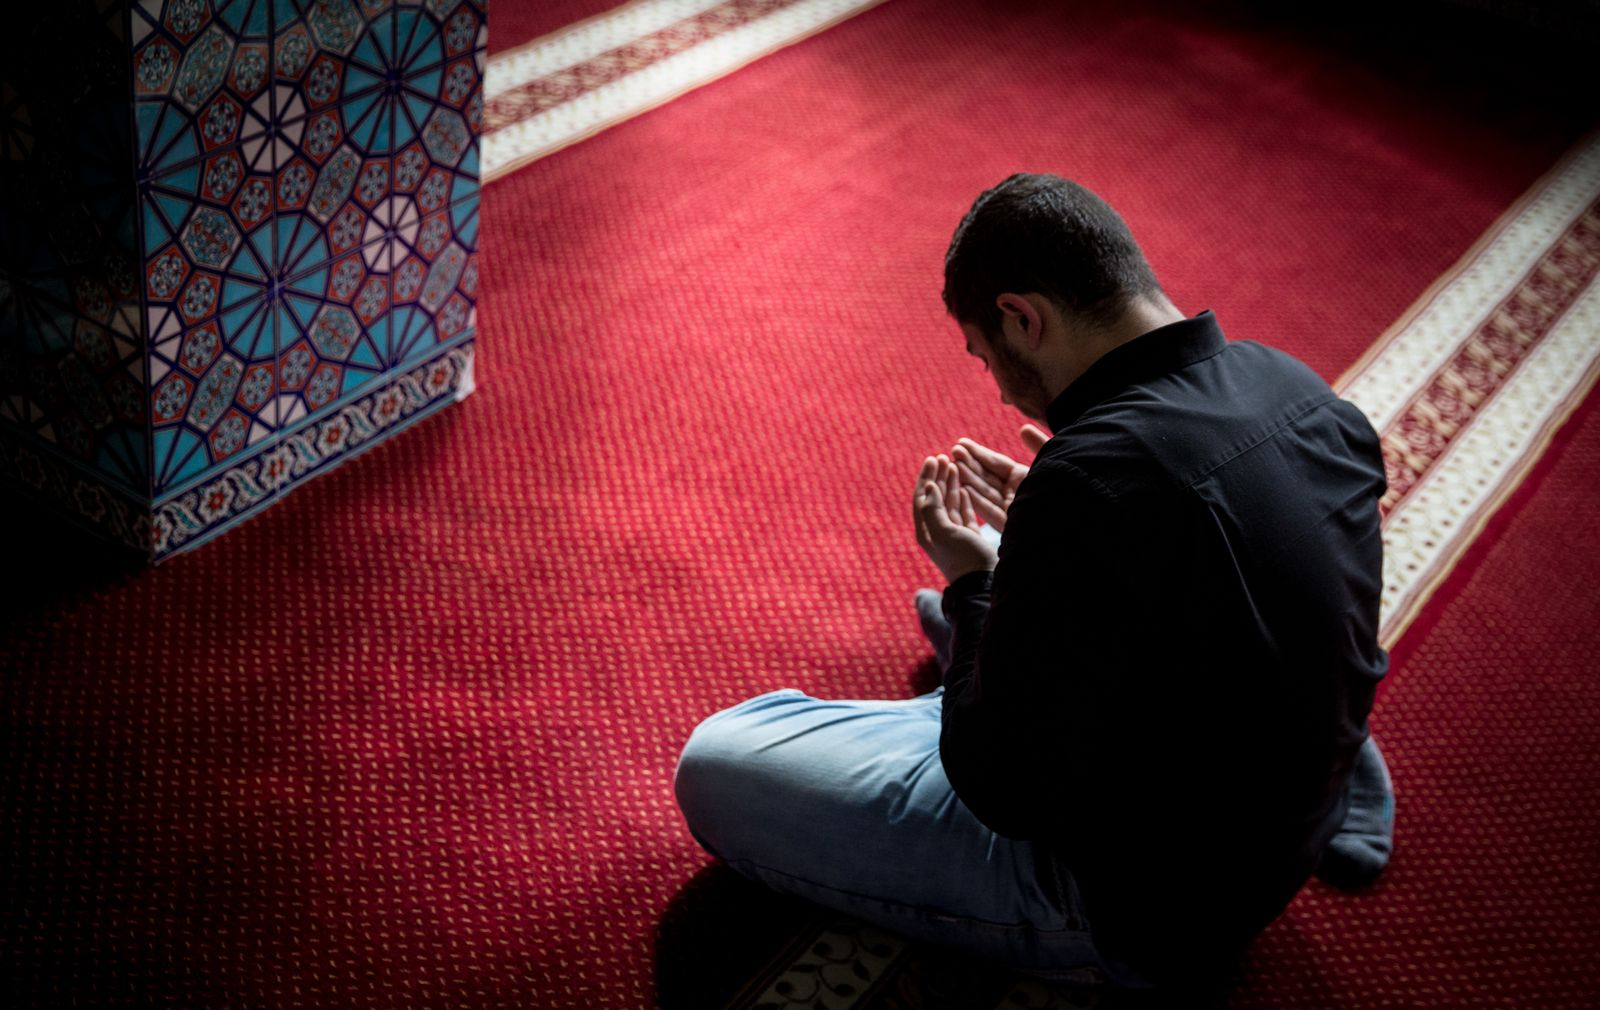 Muslim / Moschee / Beten